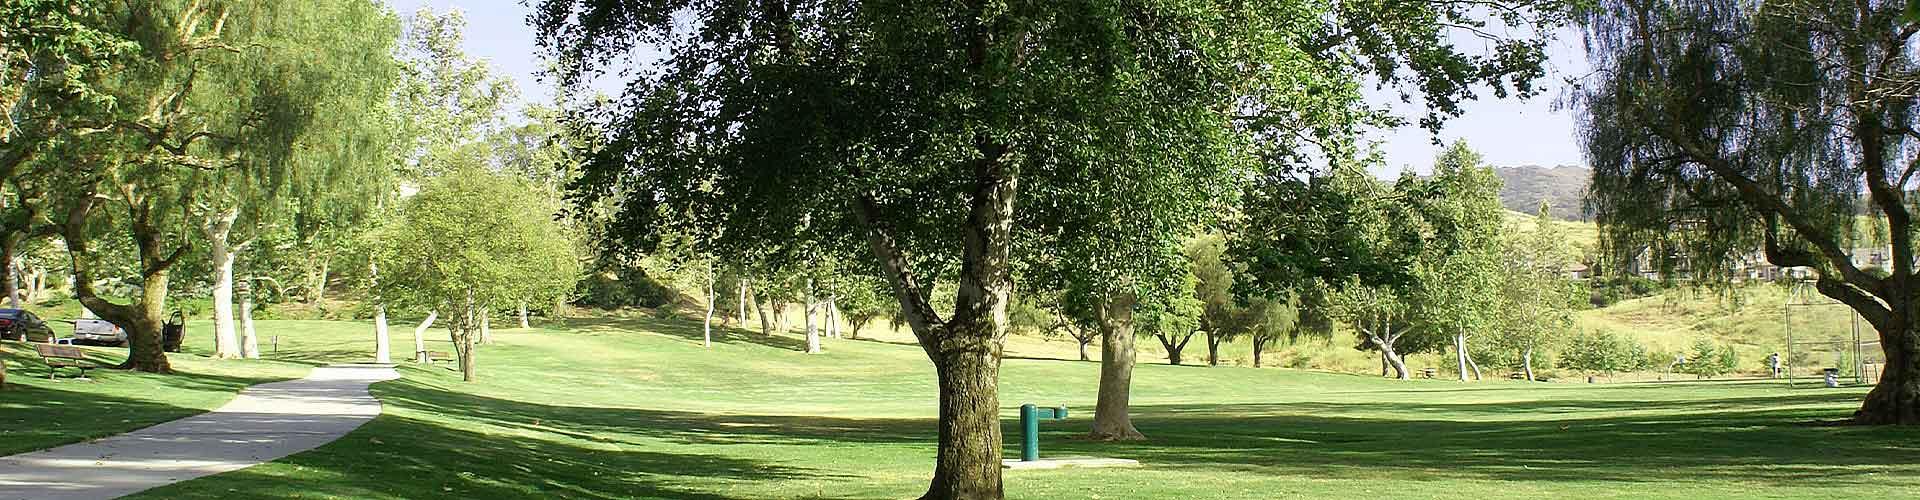 Sycamore Park Header